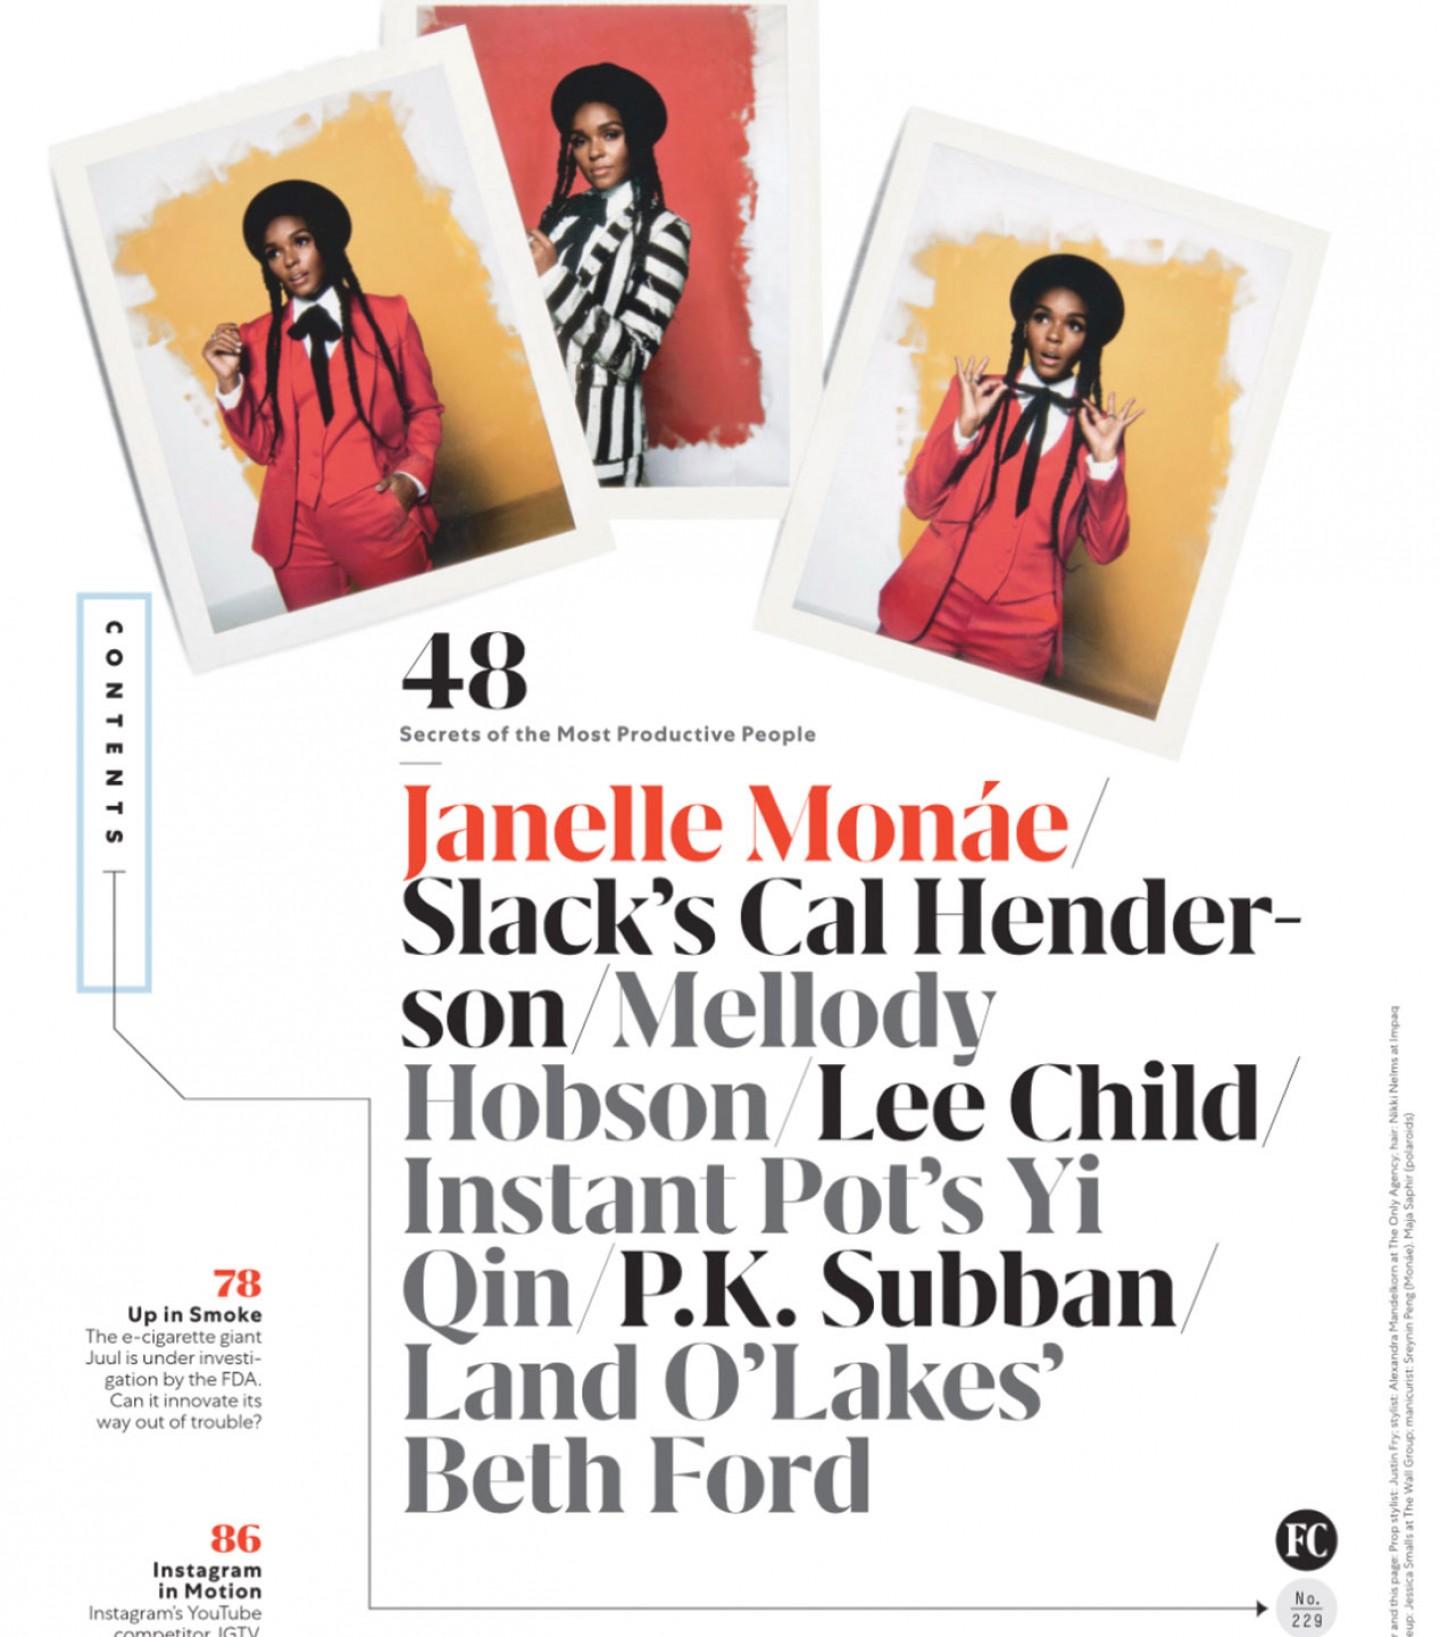 JANELLE MONAE - Cover